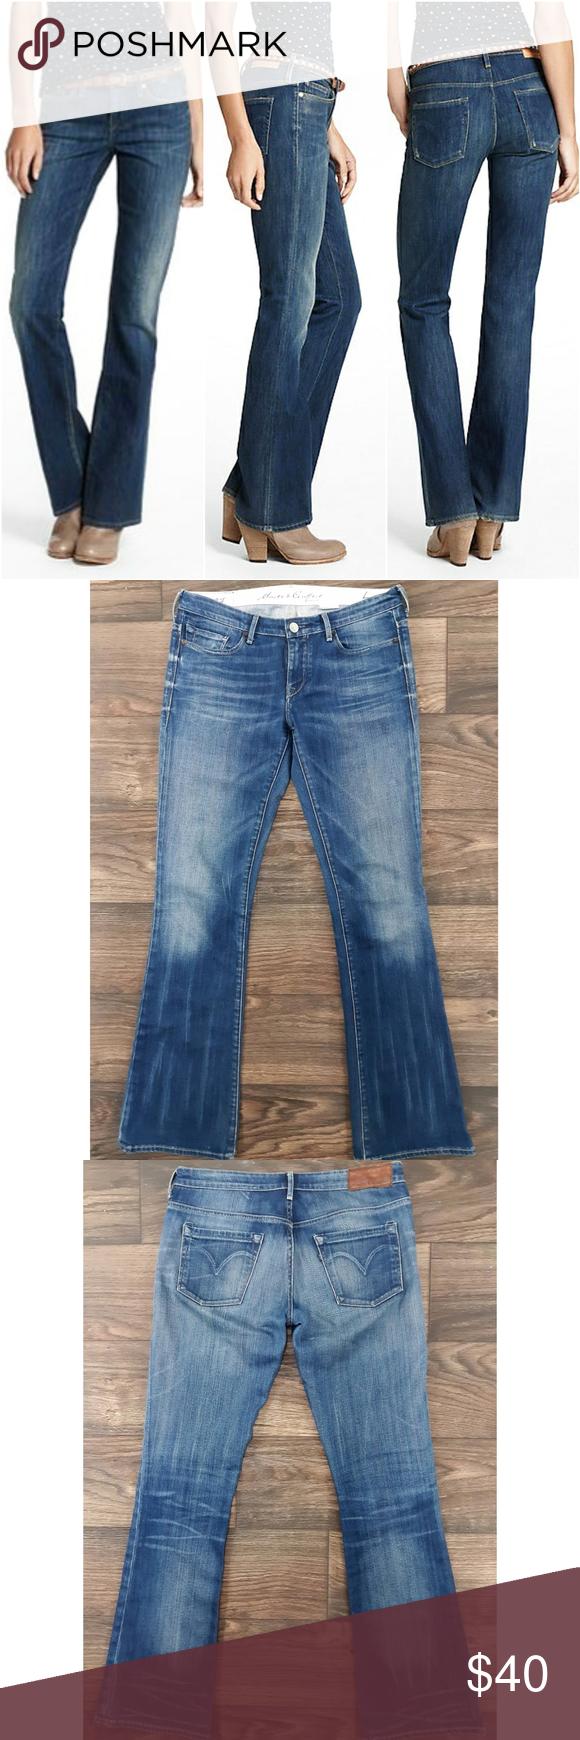 10+ True craft jeans bootcut ideas